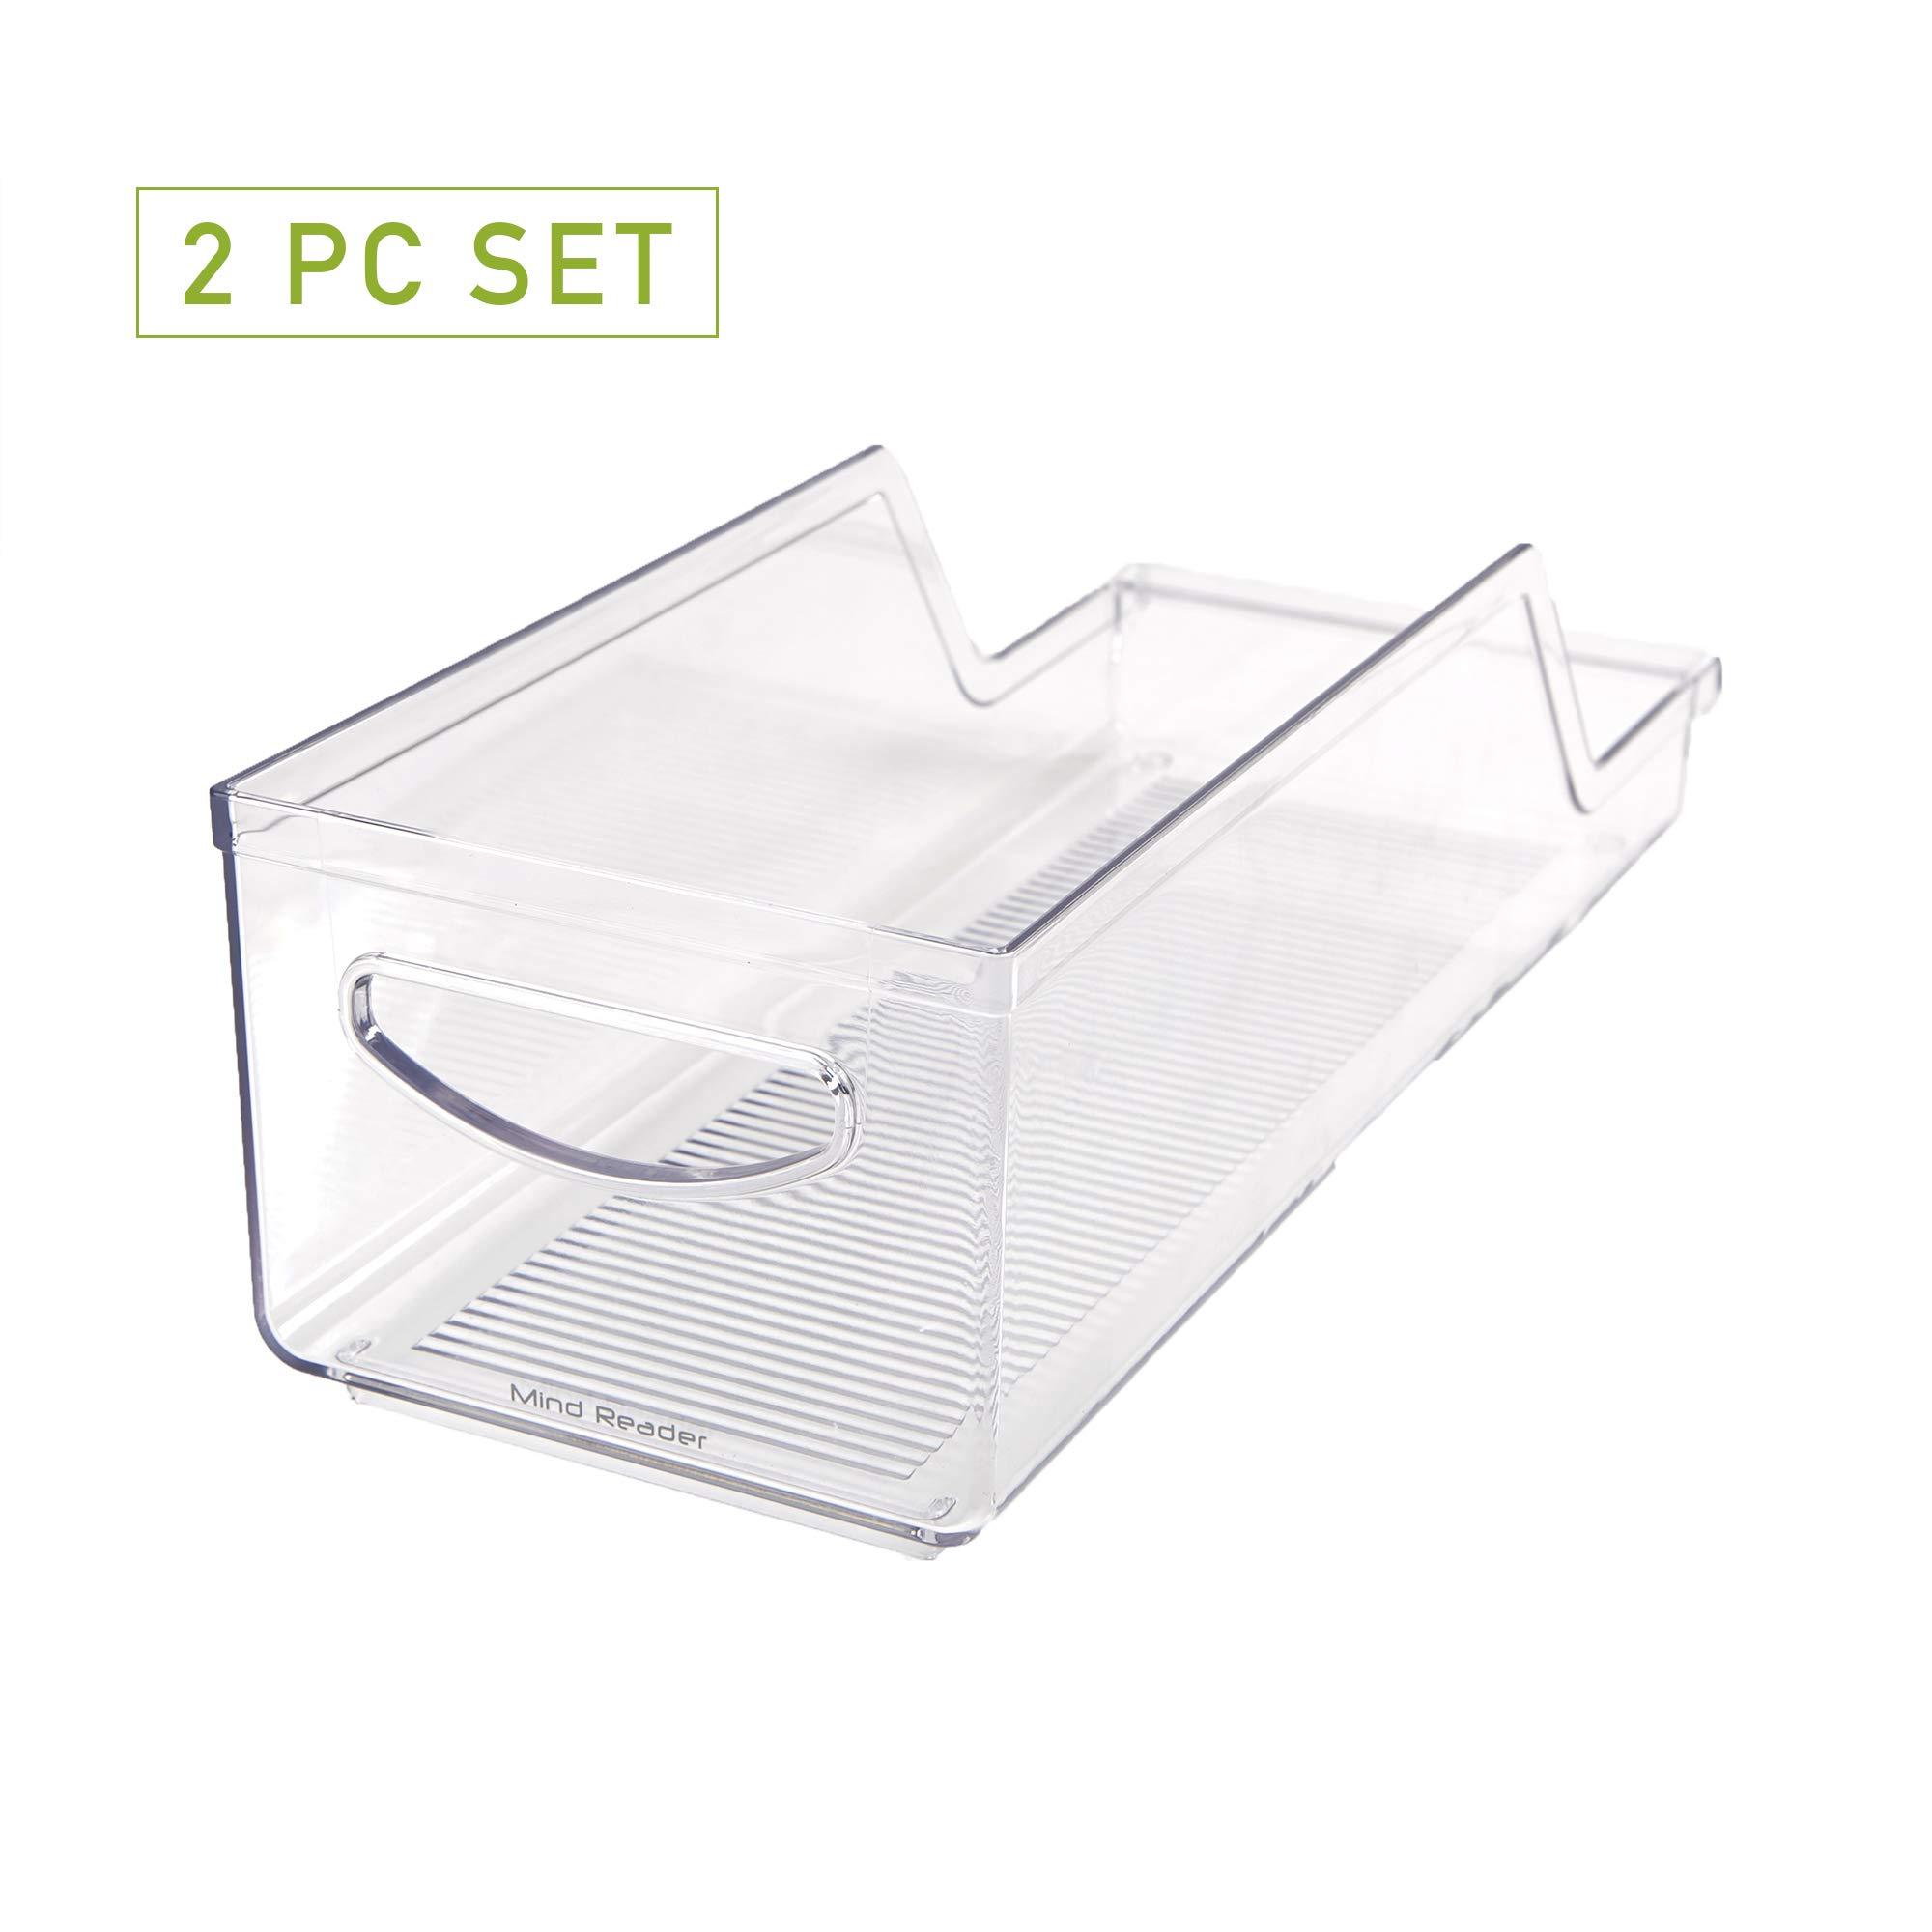 Mind Reader SCANORG2-CLR Pop/Soda Can Dispenser Storage Organizer Bin for Kitchen Pantry, Countertops, Cabinets, Refrigerator 2 Pack, Clear